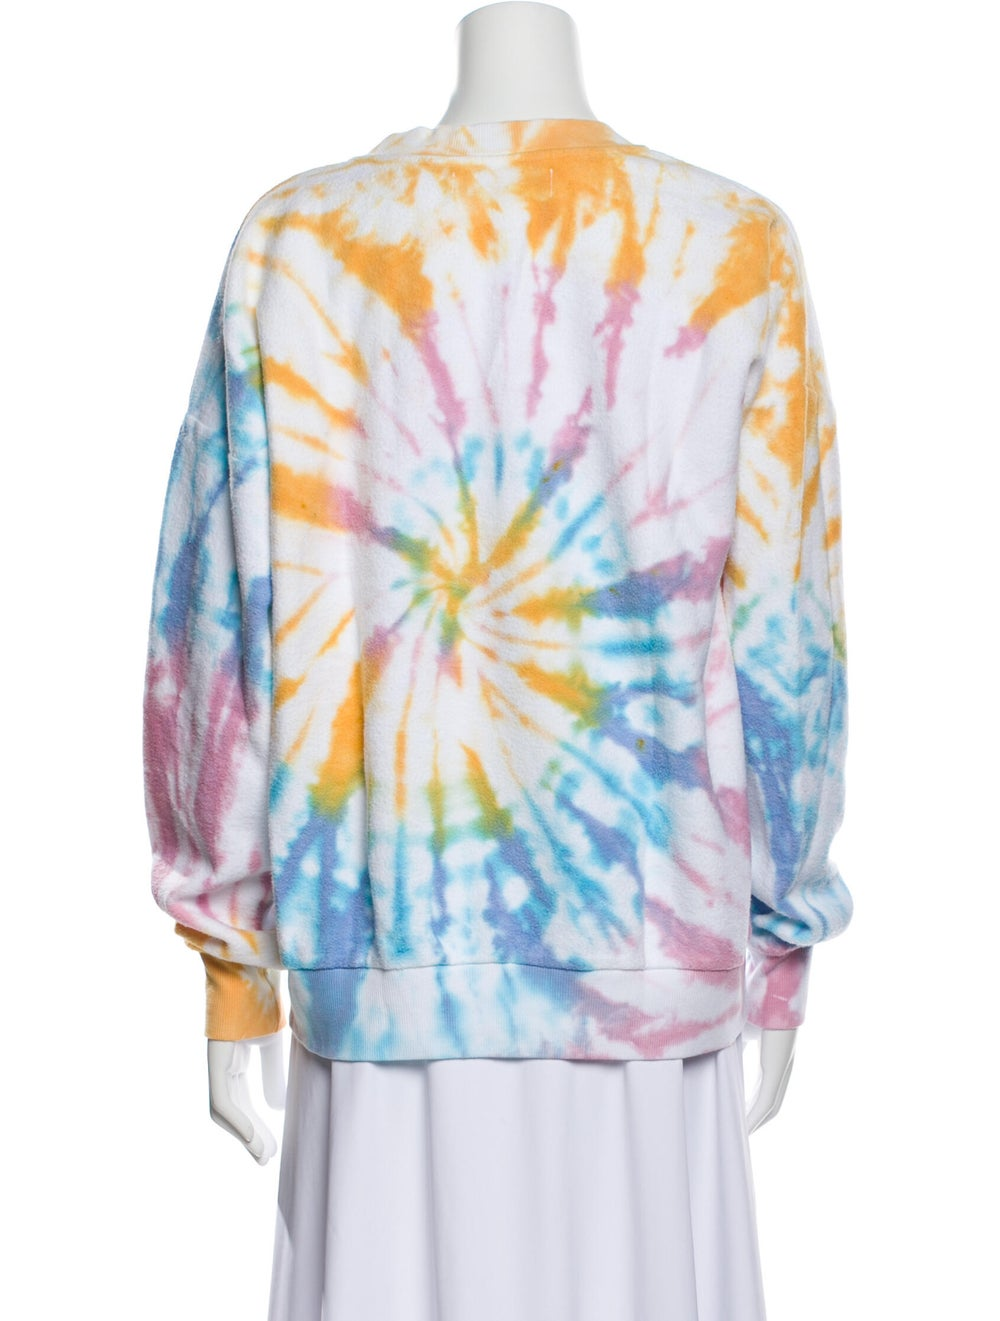 Sprwmn Tie-Dye Print Crew Neck Sweater Blue - image 3